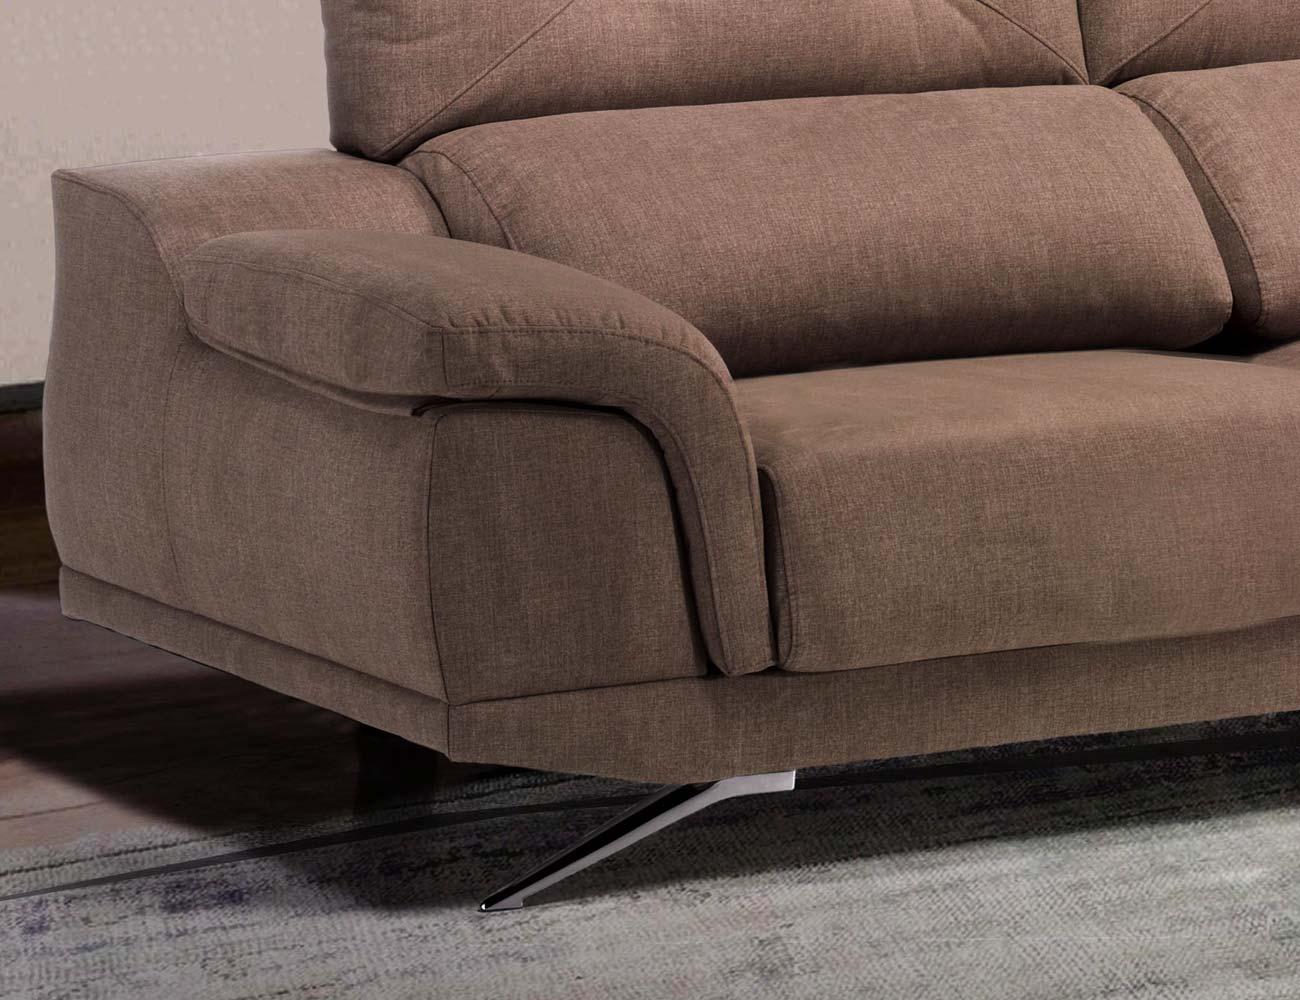 Sofa chaiselongue florencia detalle